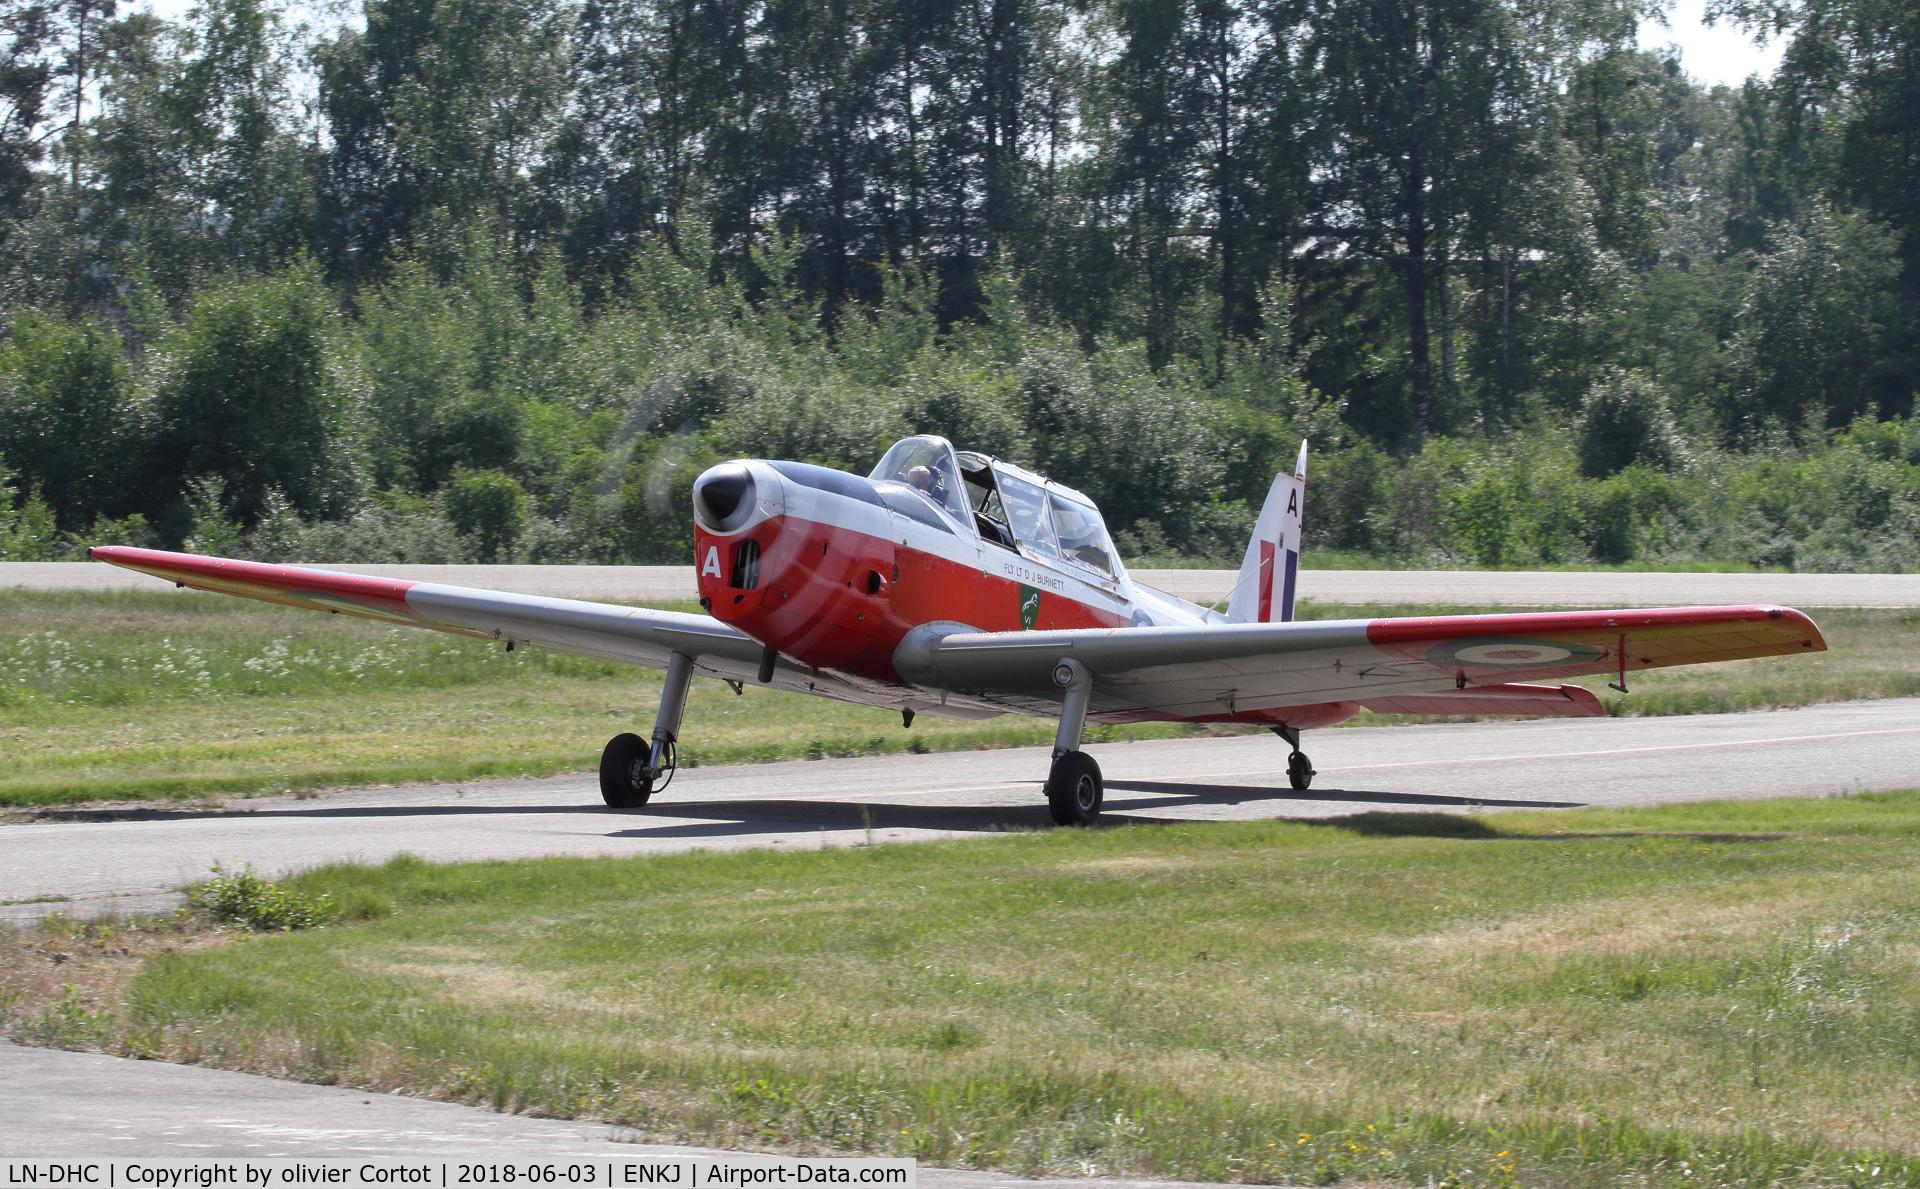 LN-DHC, 1950 De Havilland DHC-1 Chipmunk T.10 C/N C1/0038, Kjeller airshow